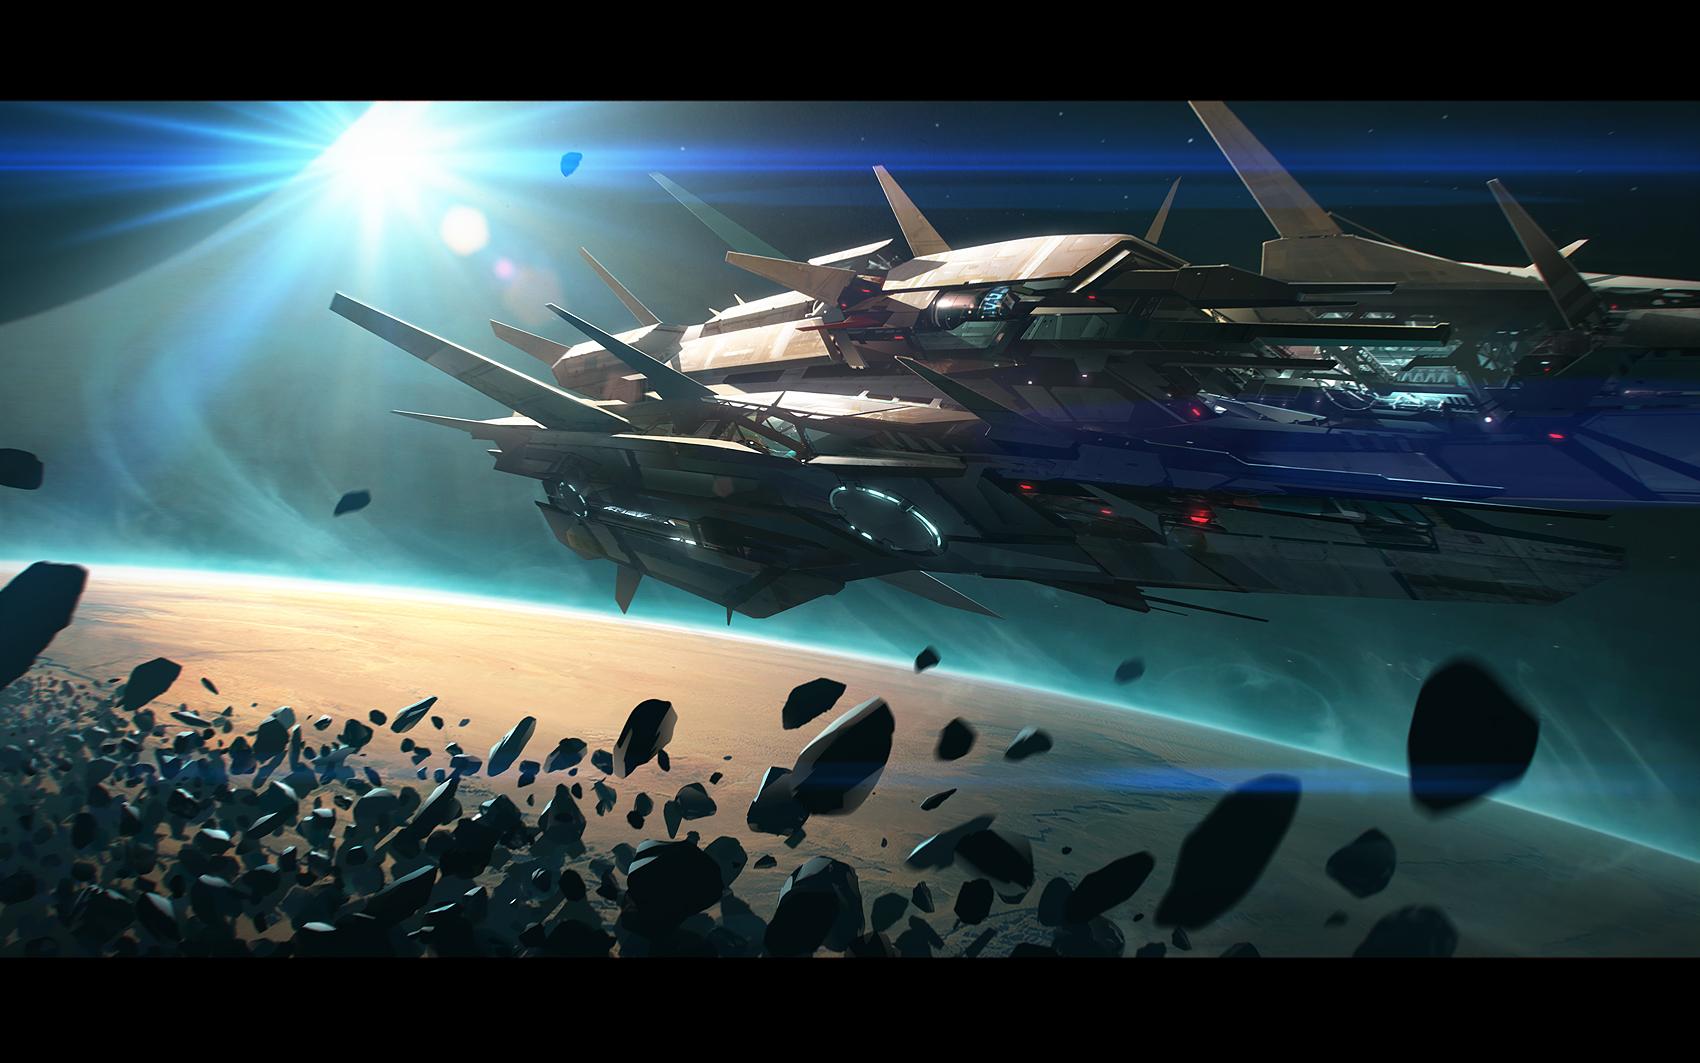 Asteroid shore